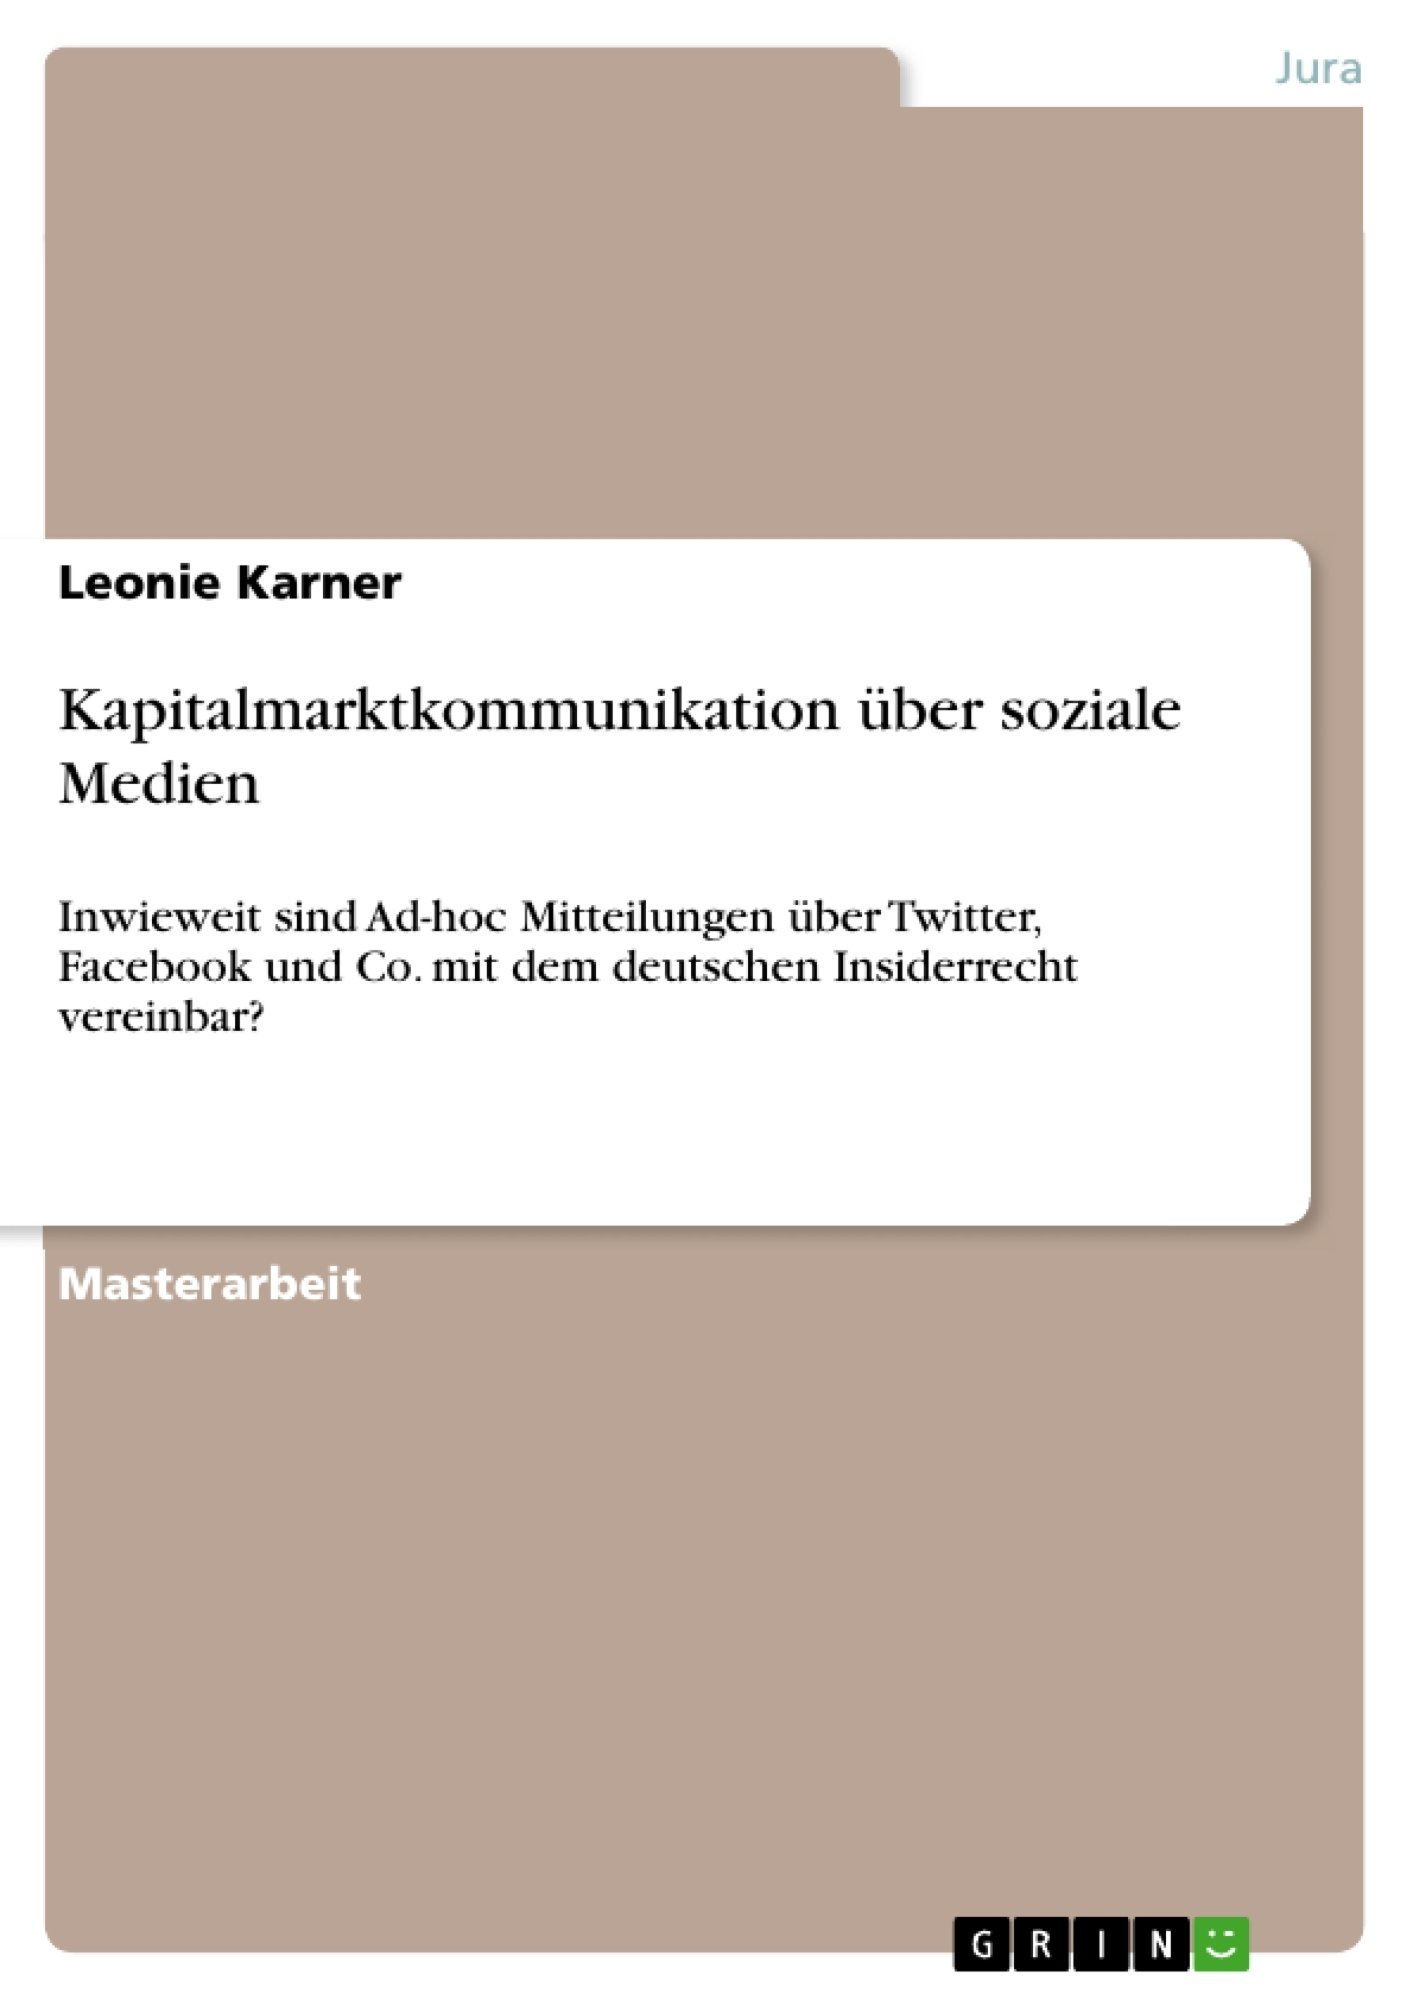 Titel: Kapitalmarktkommunikation über soziale Medien